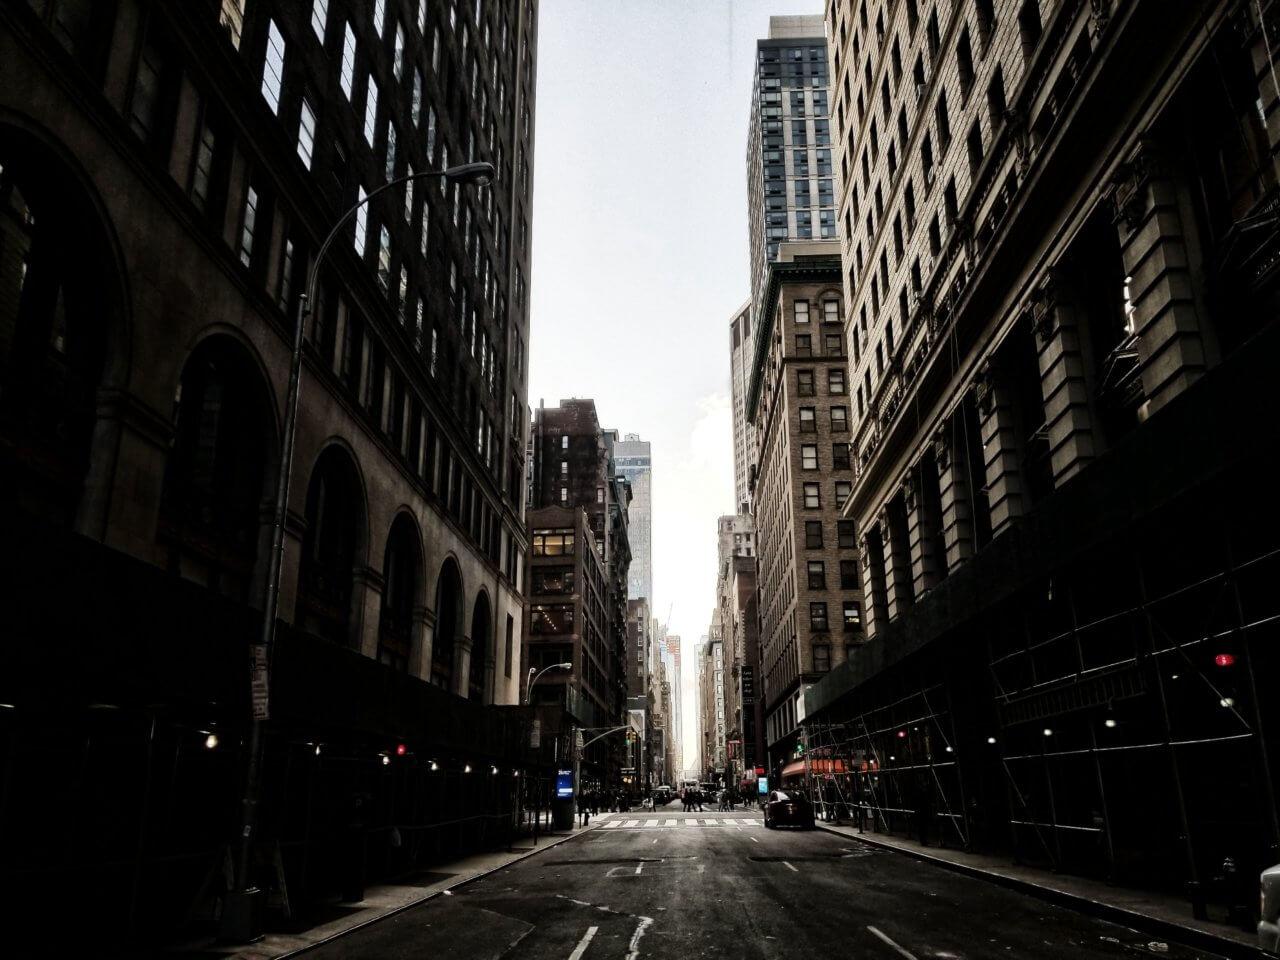 City Lanes I